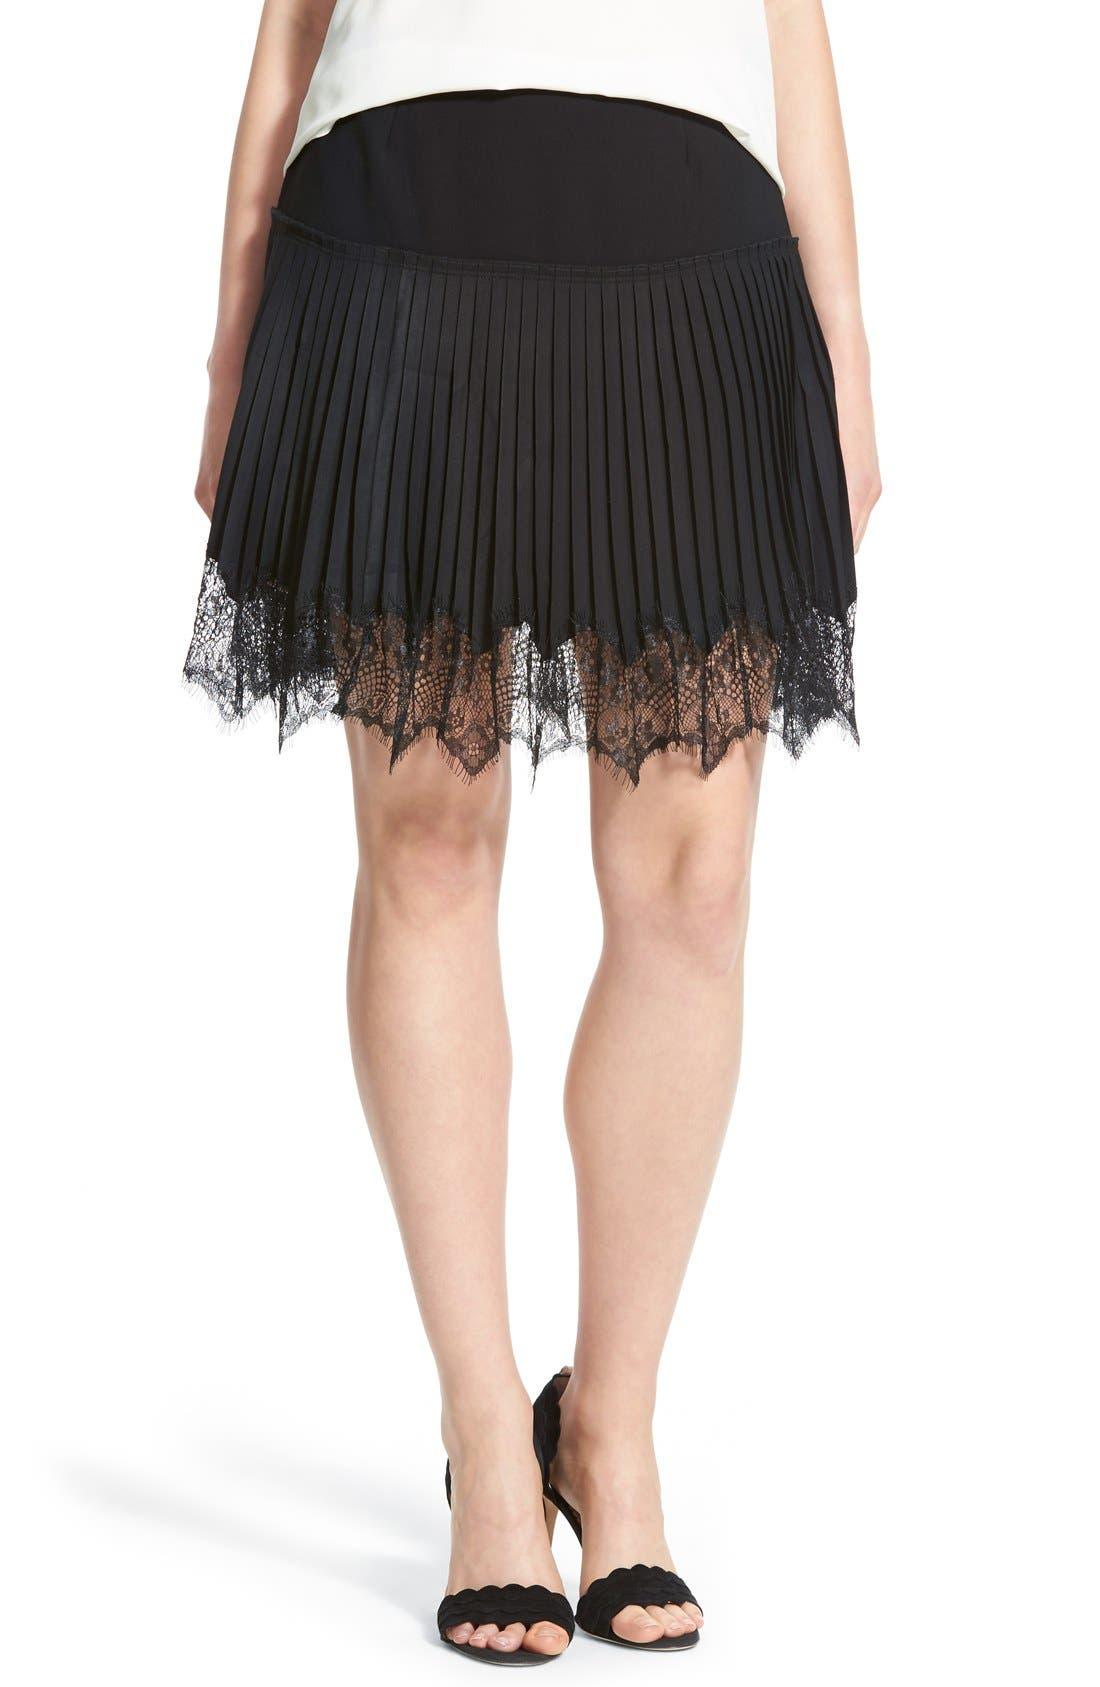 Alternate Image 1 Selected - Chelsea28 Lace Trim Pleat Miniskirt